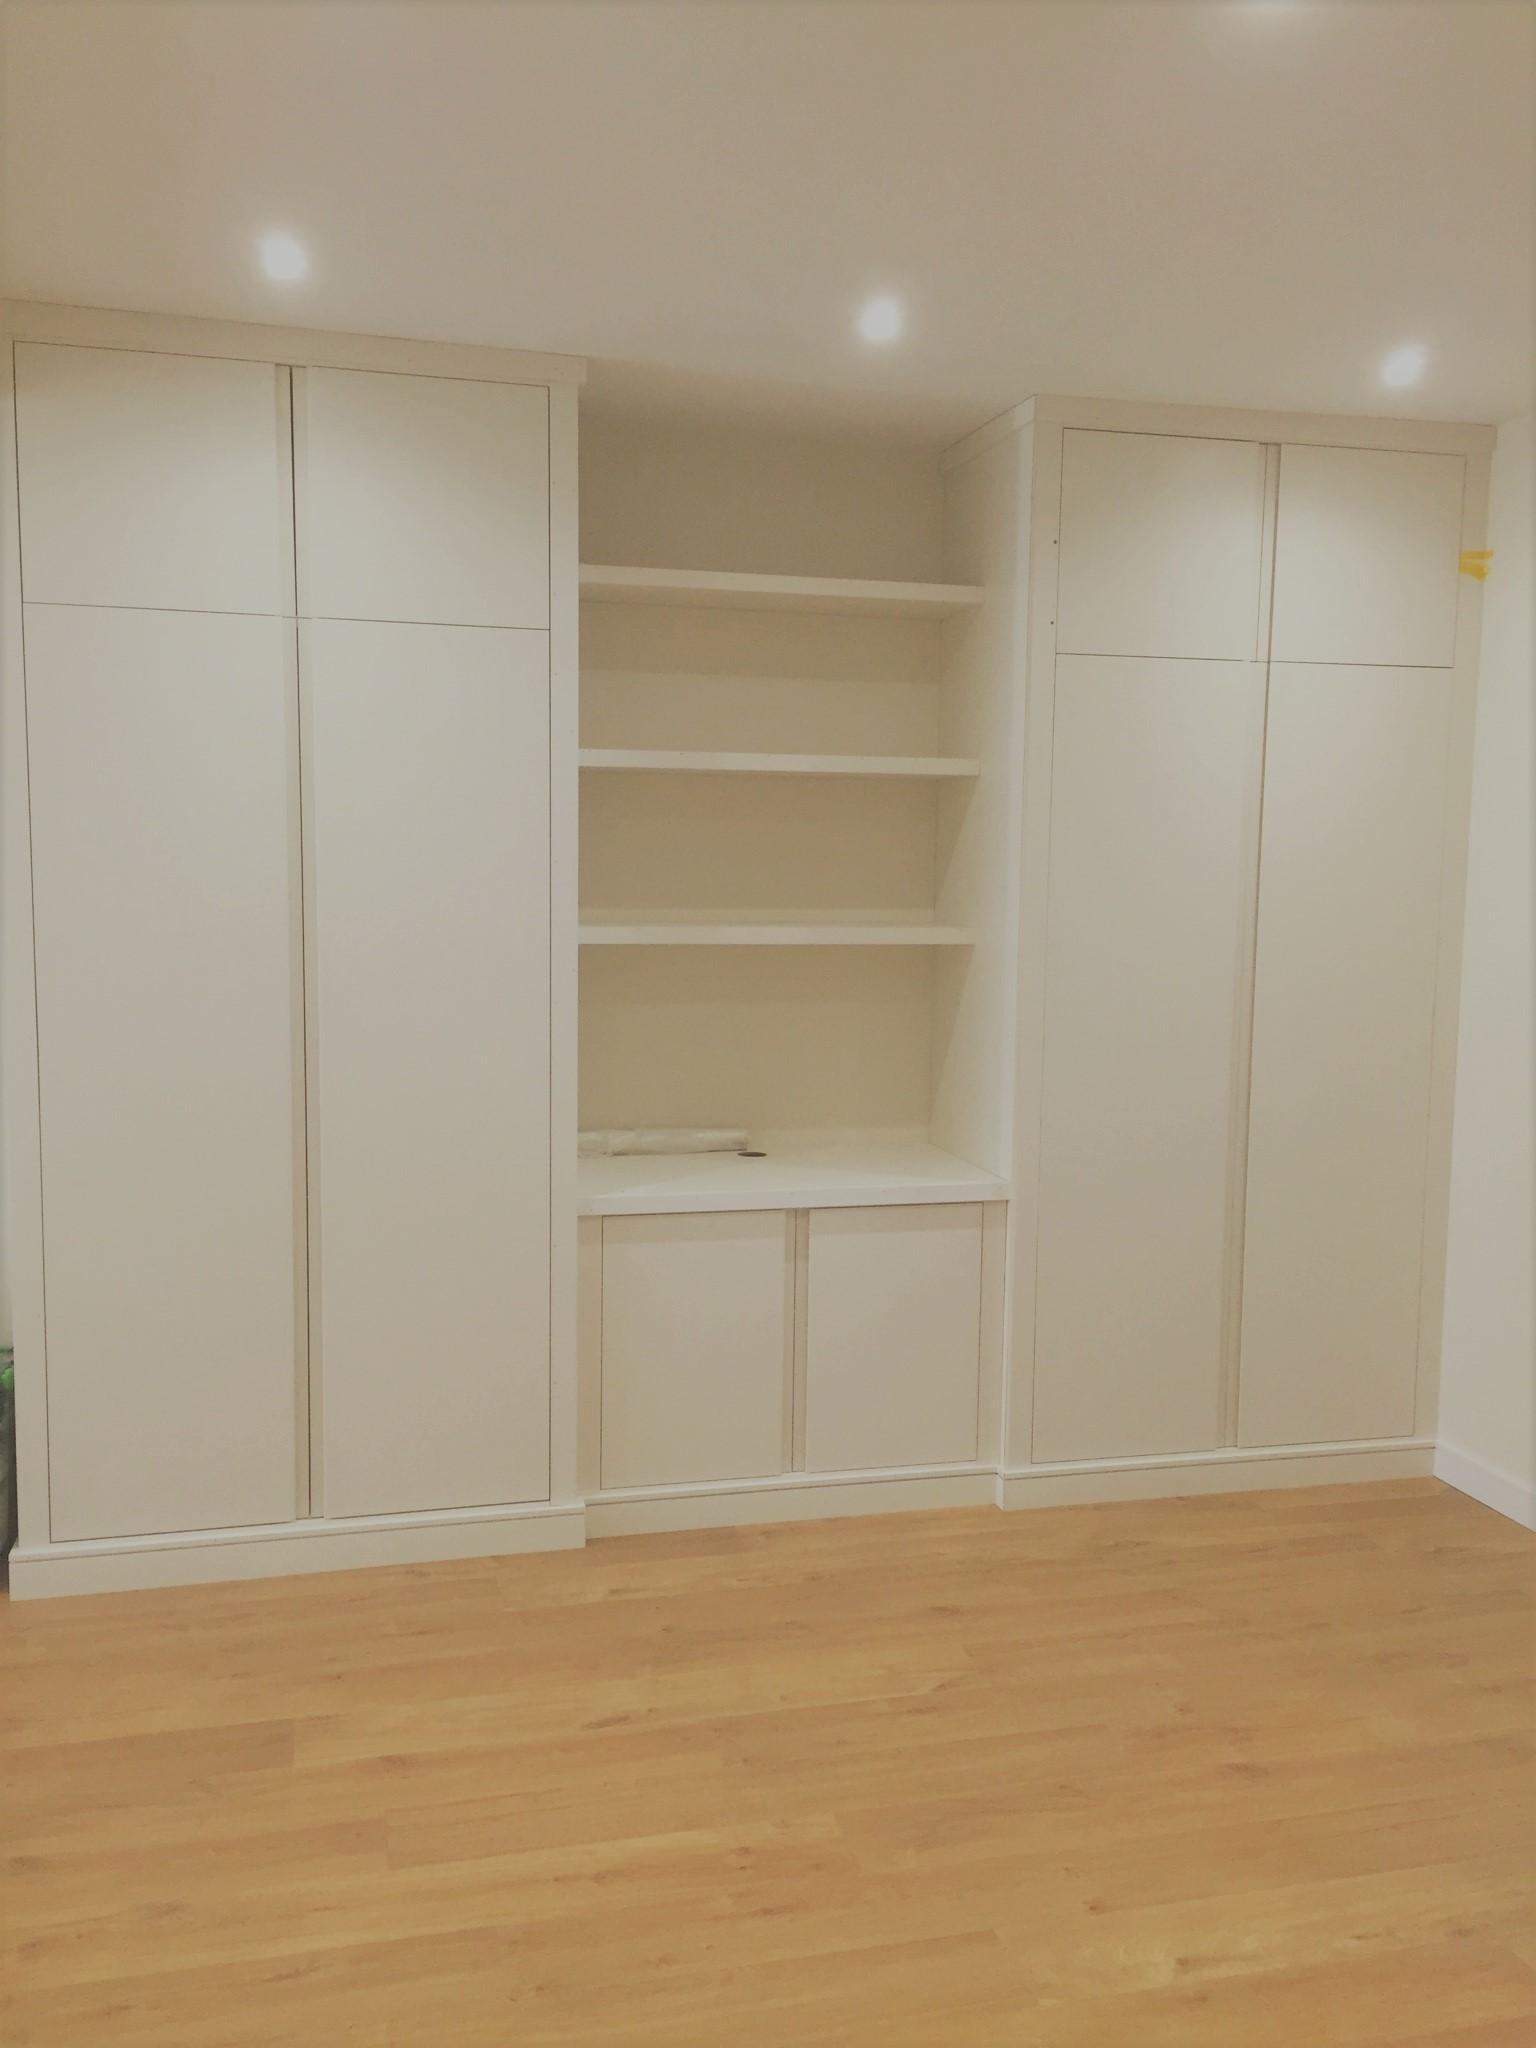 A contemporary wardrobe with a dividing base unit and shelves.